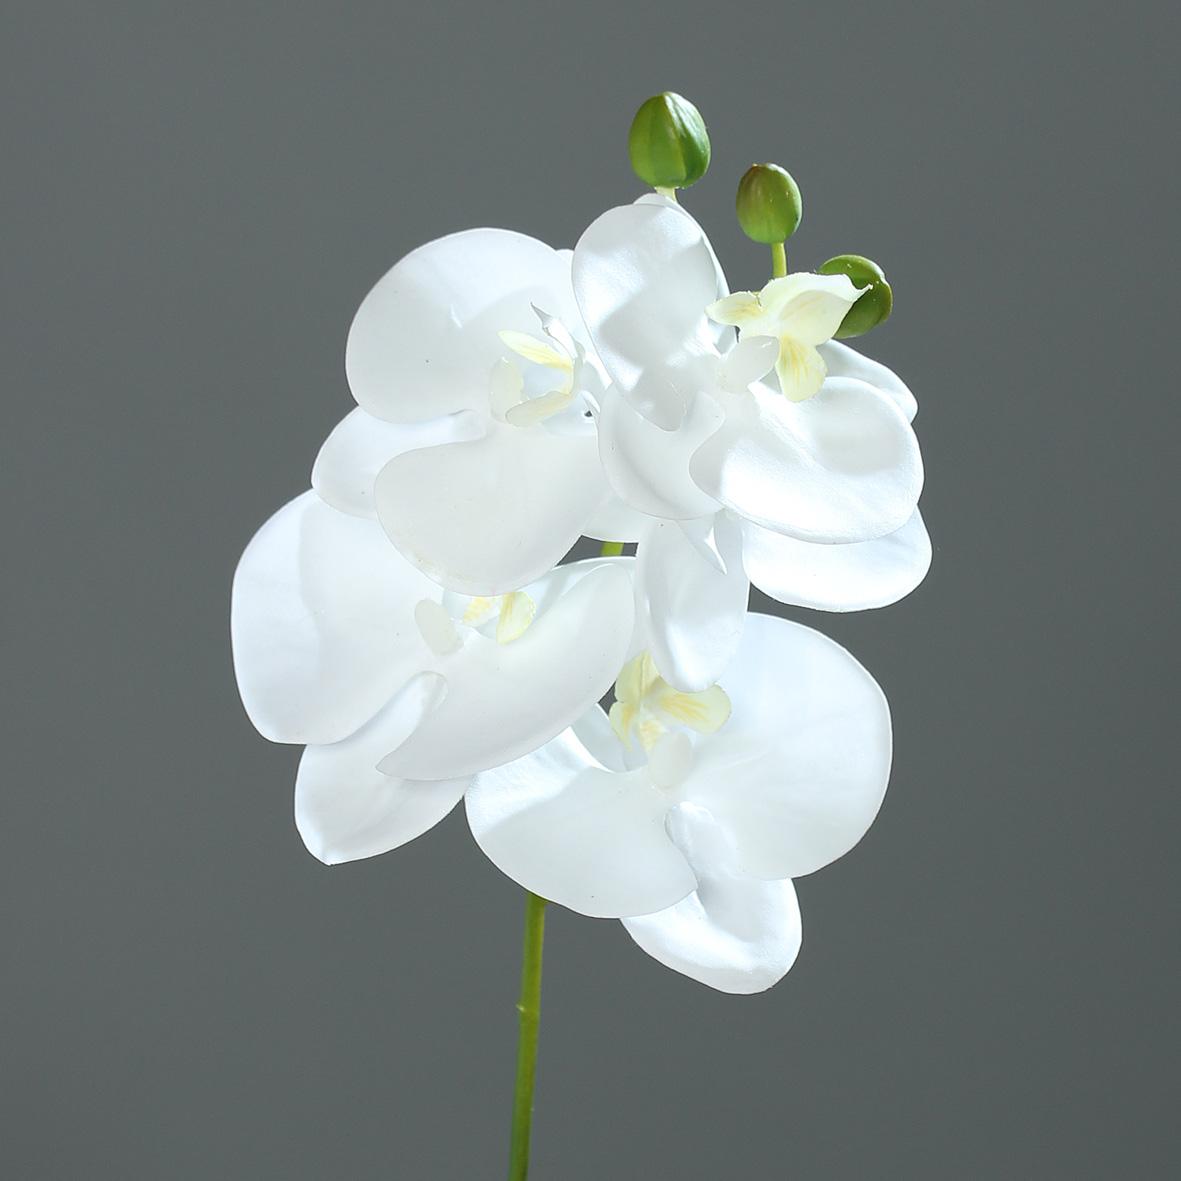 orchideenzweig real touch 36cm wei dp kunstblumen. Black Bedroom Furniture Sets. Home Design Ideas